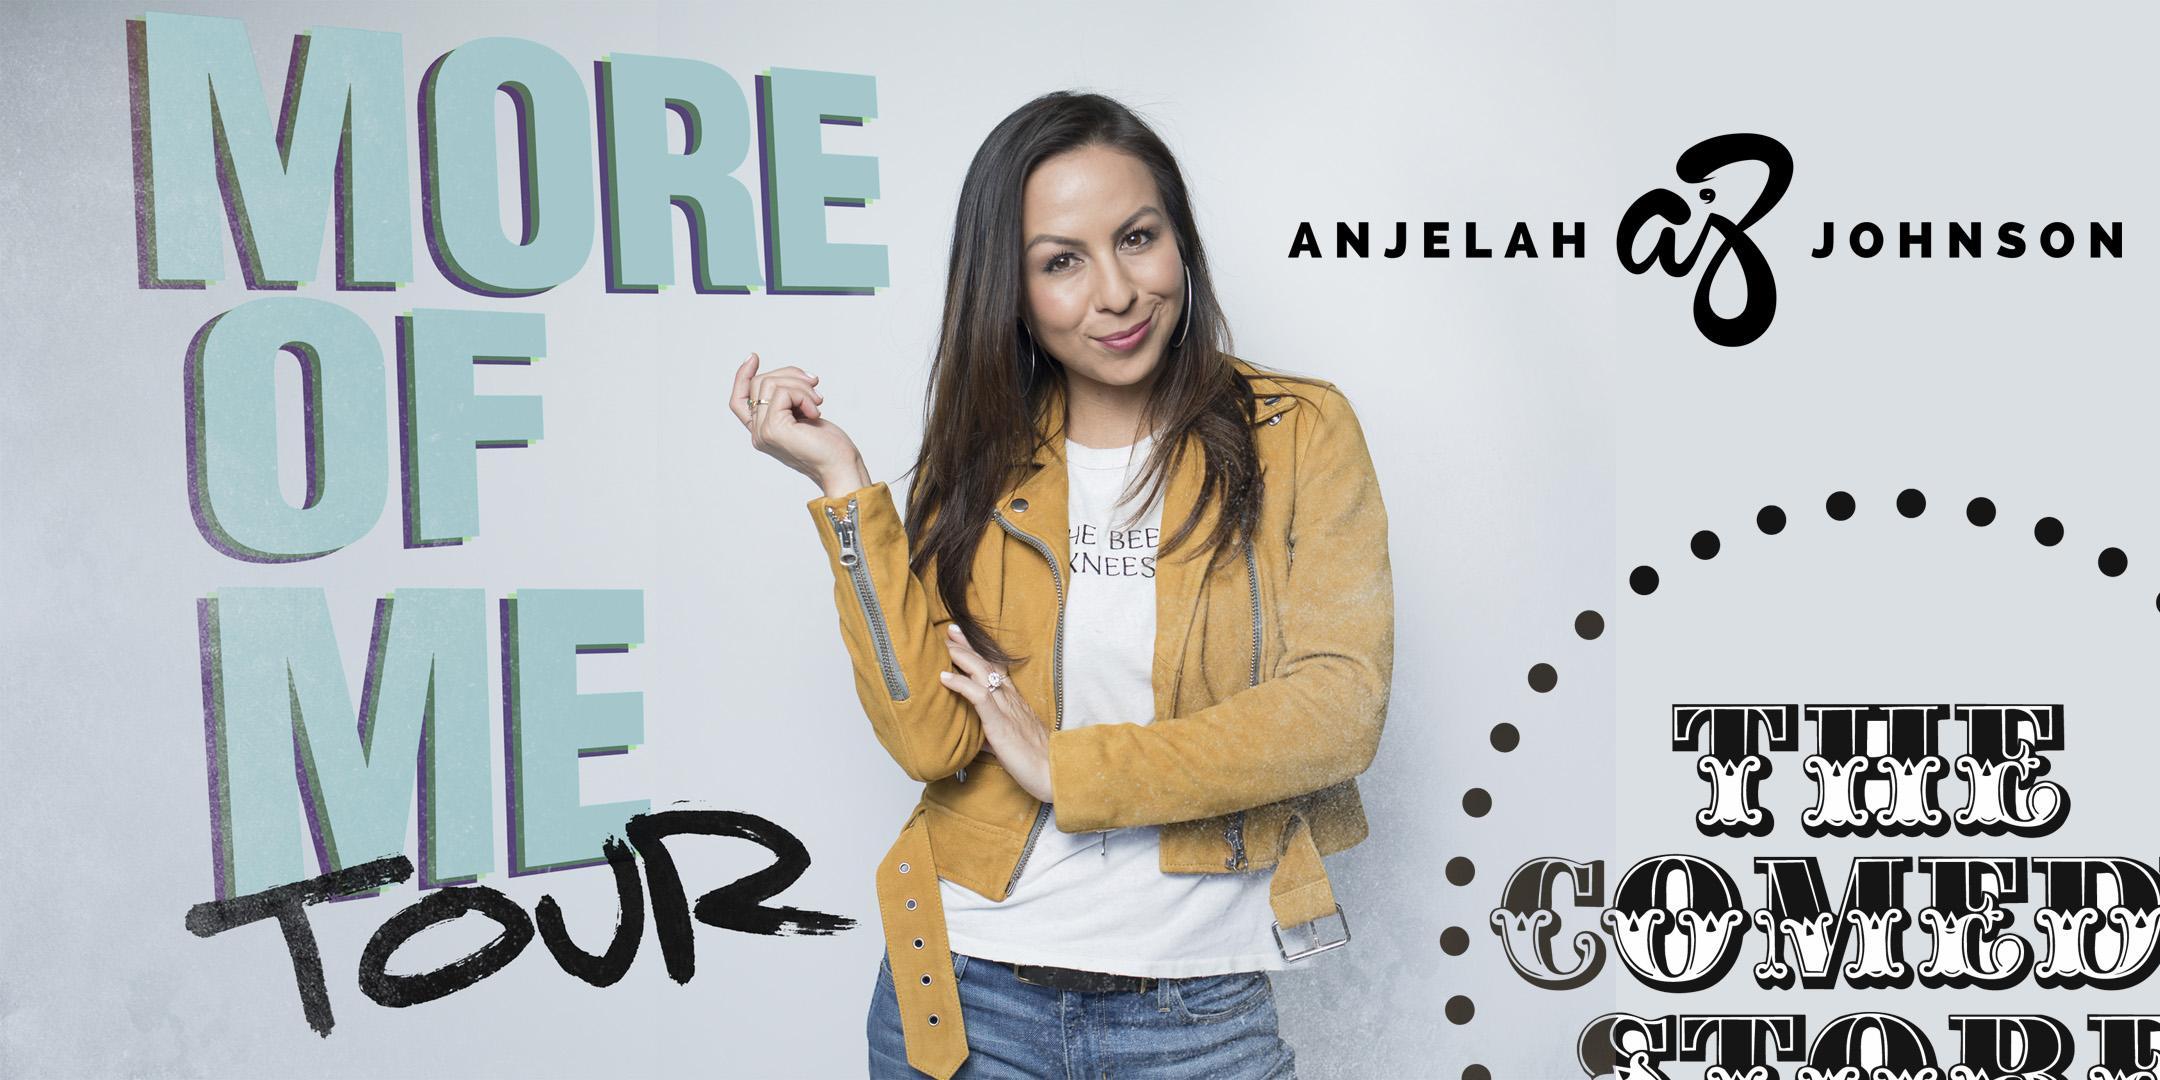 Anjelah Johnson - Friday - 7:30 & 9:45 pm Showtimes